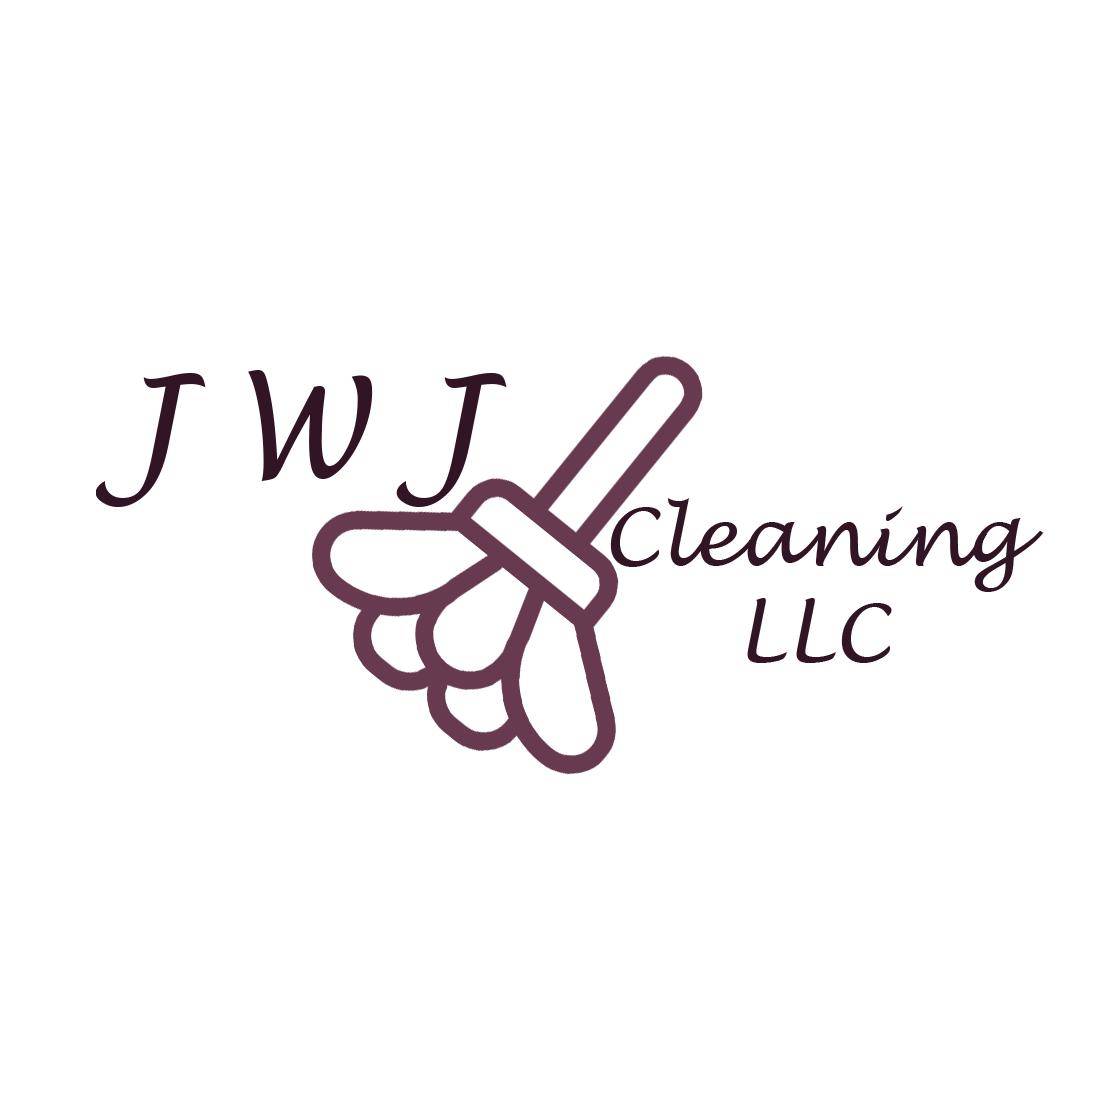 J W J Cleaning, LLC